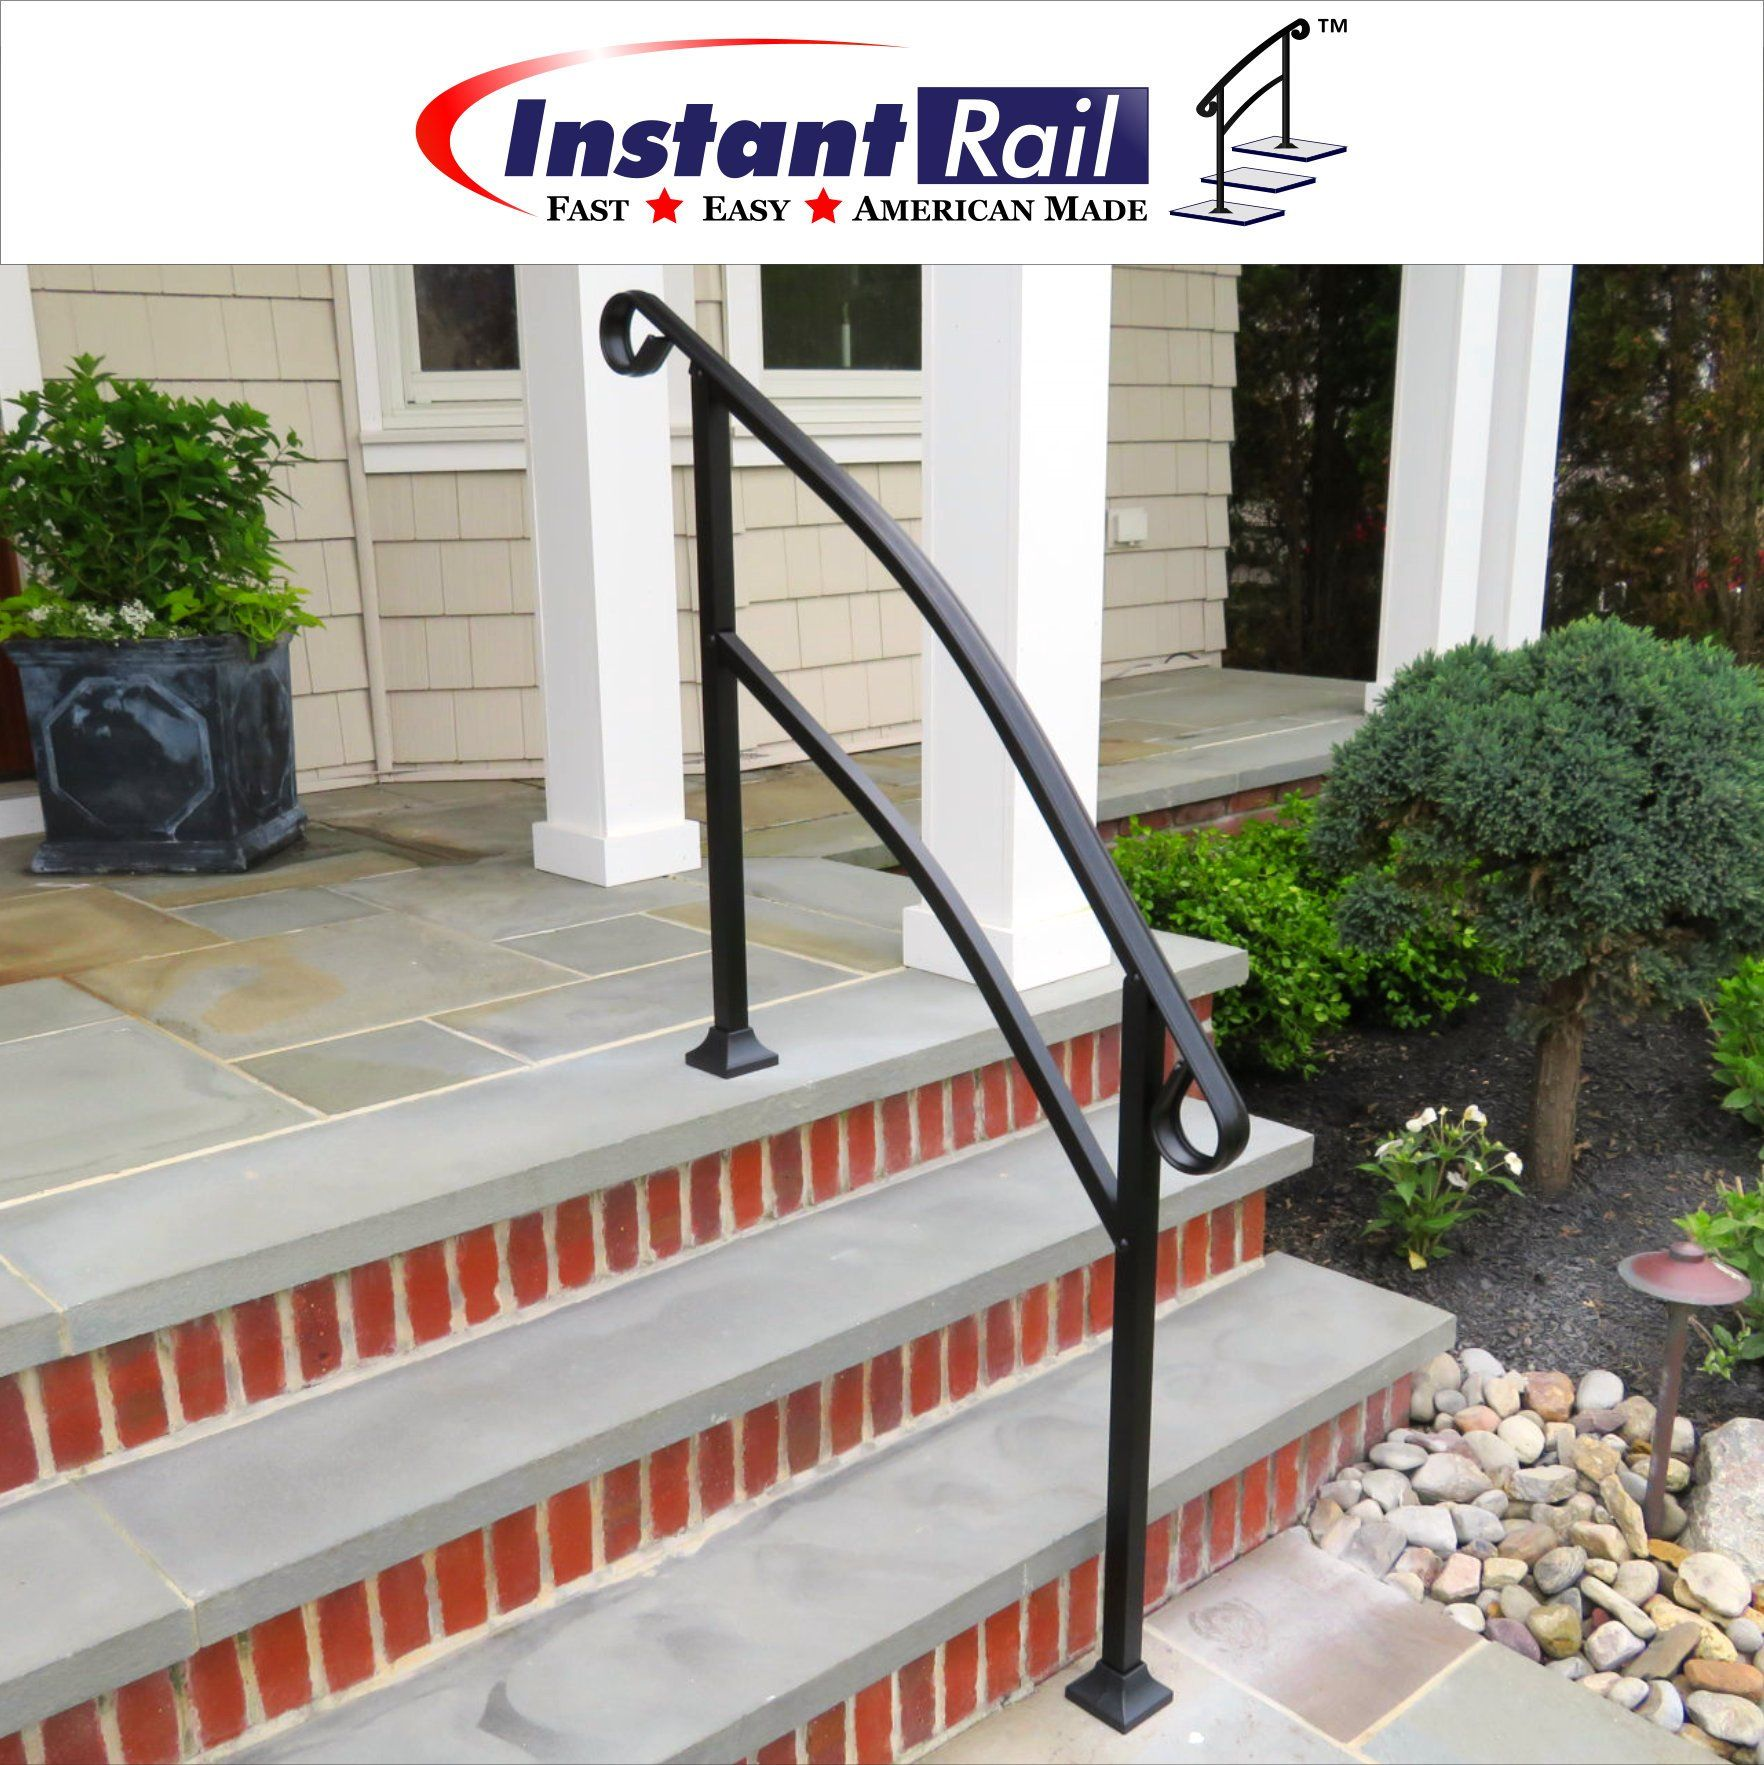 Instantrail 4 Step Adjustable Handrail For Concrete Steps   Handrails For Concrete Steps   Deck Stair   Ada   Wood   7 Hand   Concrete Entrance